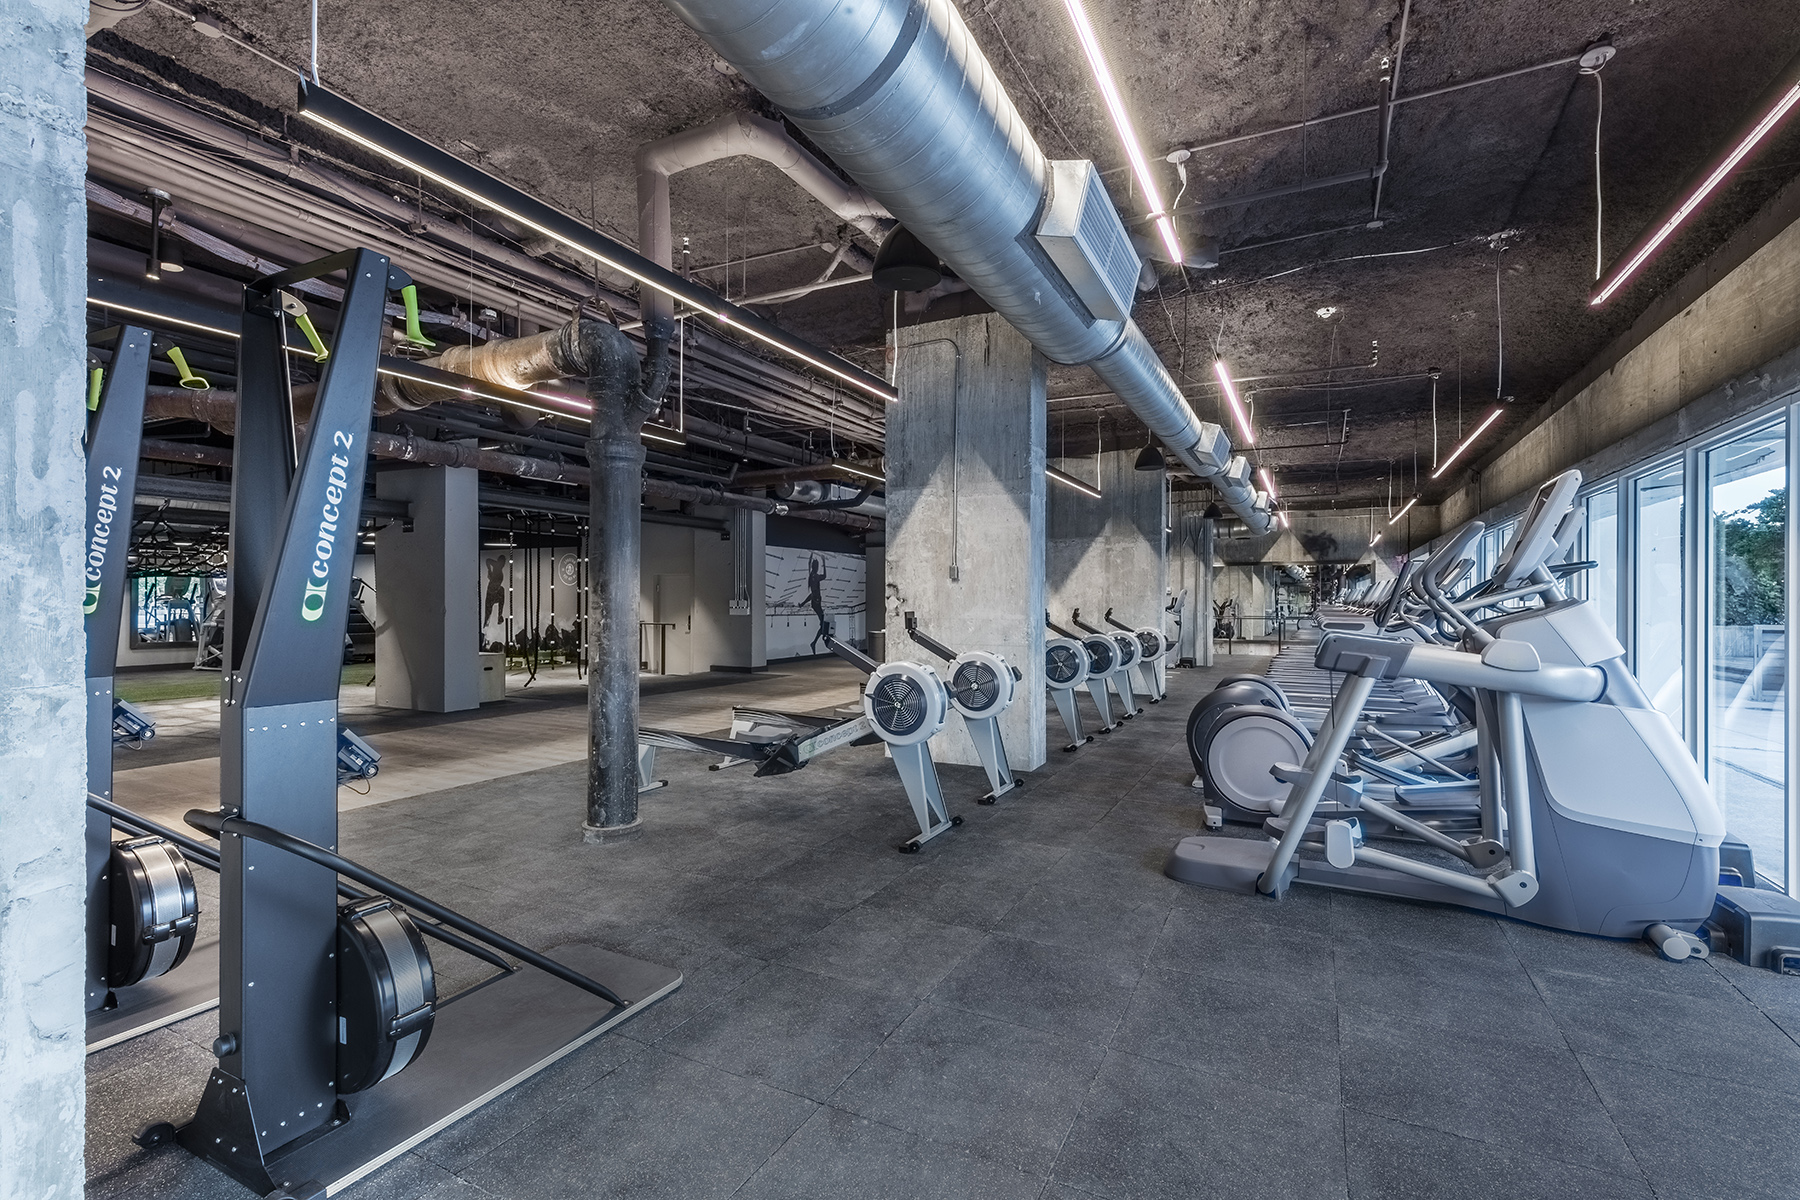 Tour 1 Hotel South Beach S New Spartan Gym Curbed Miami